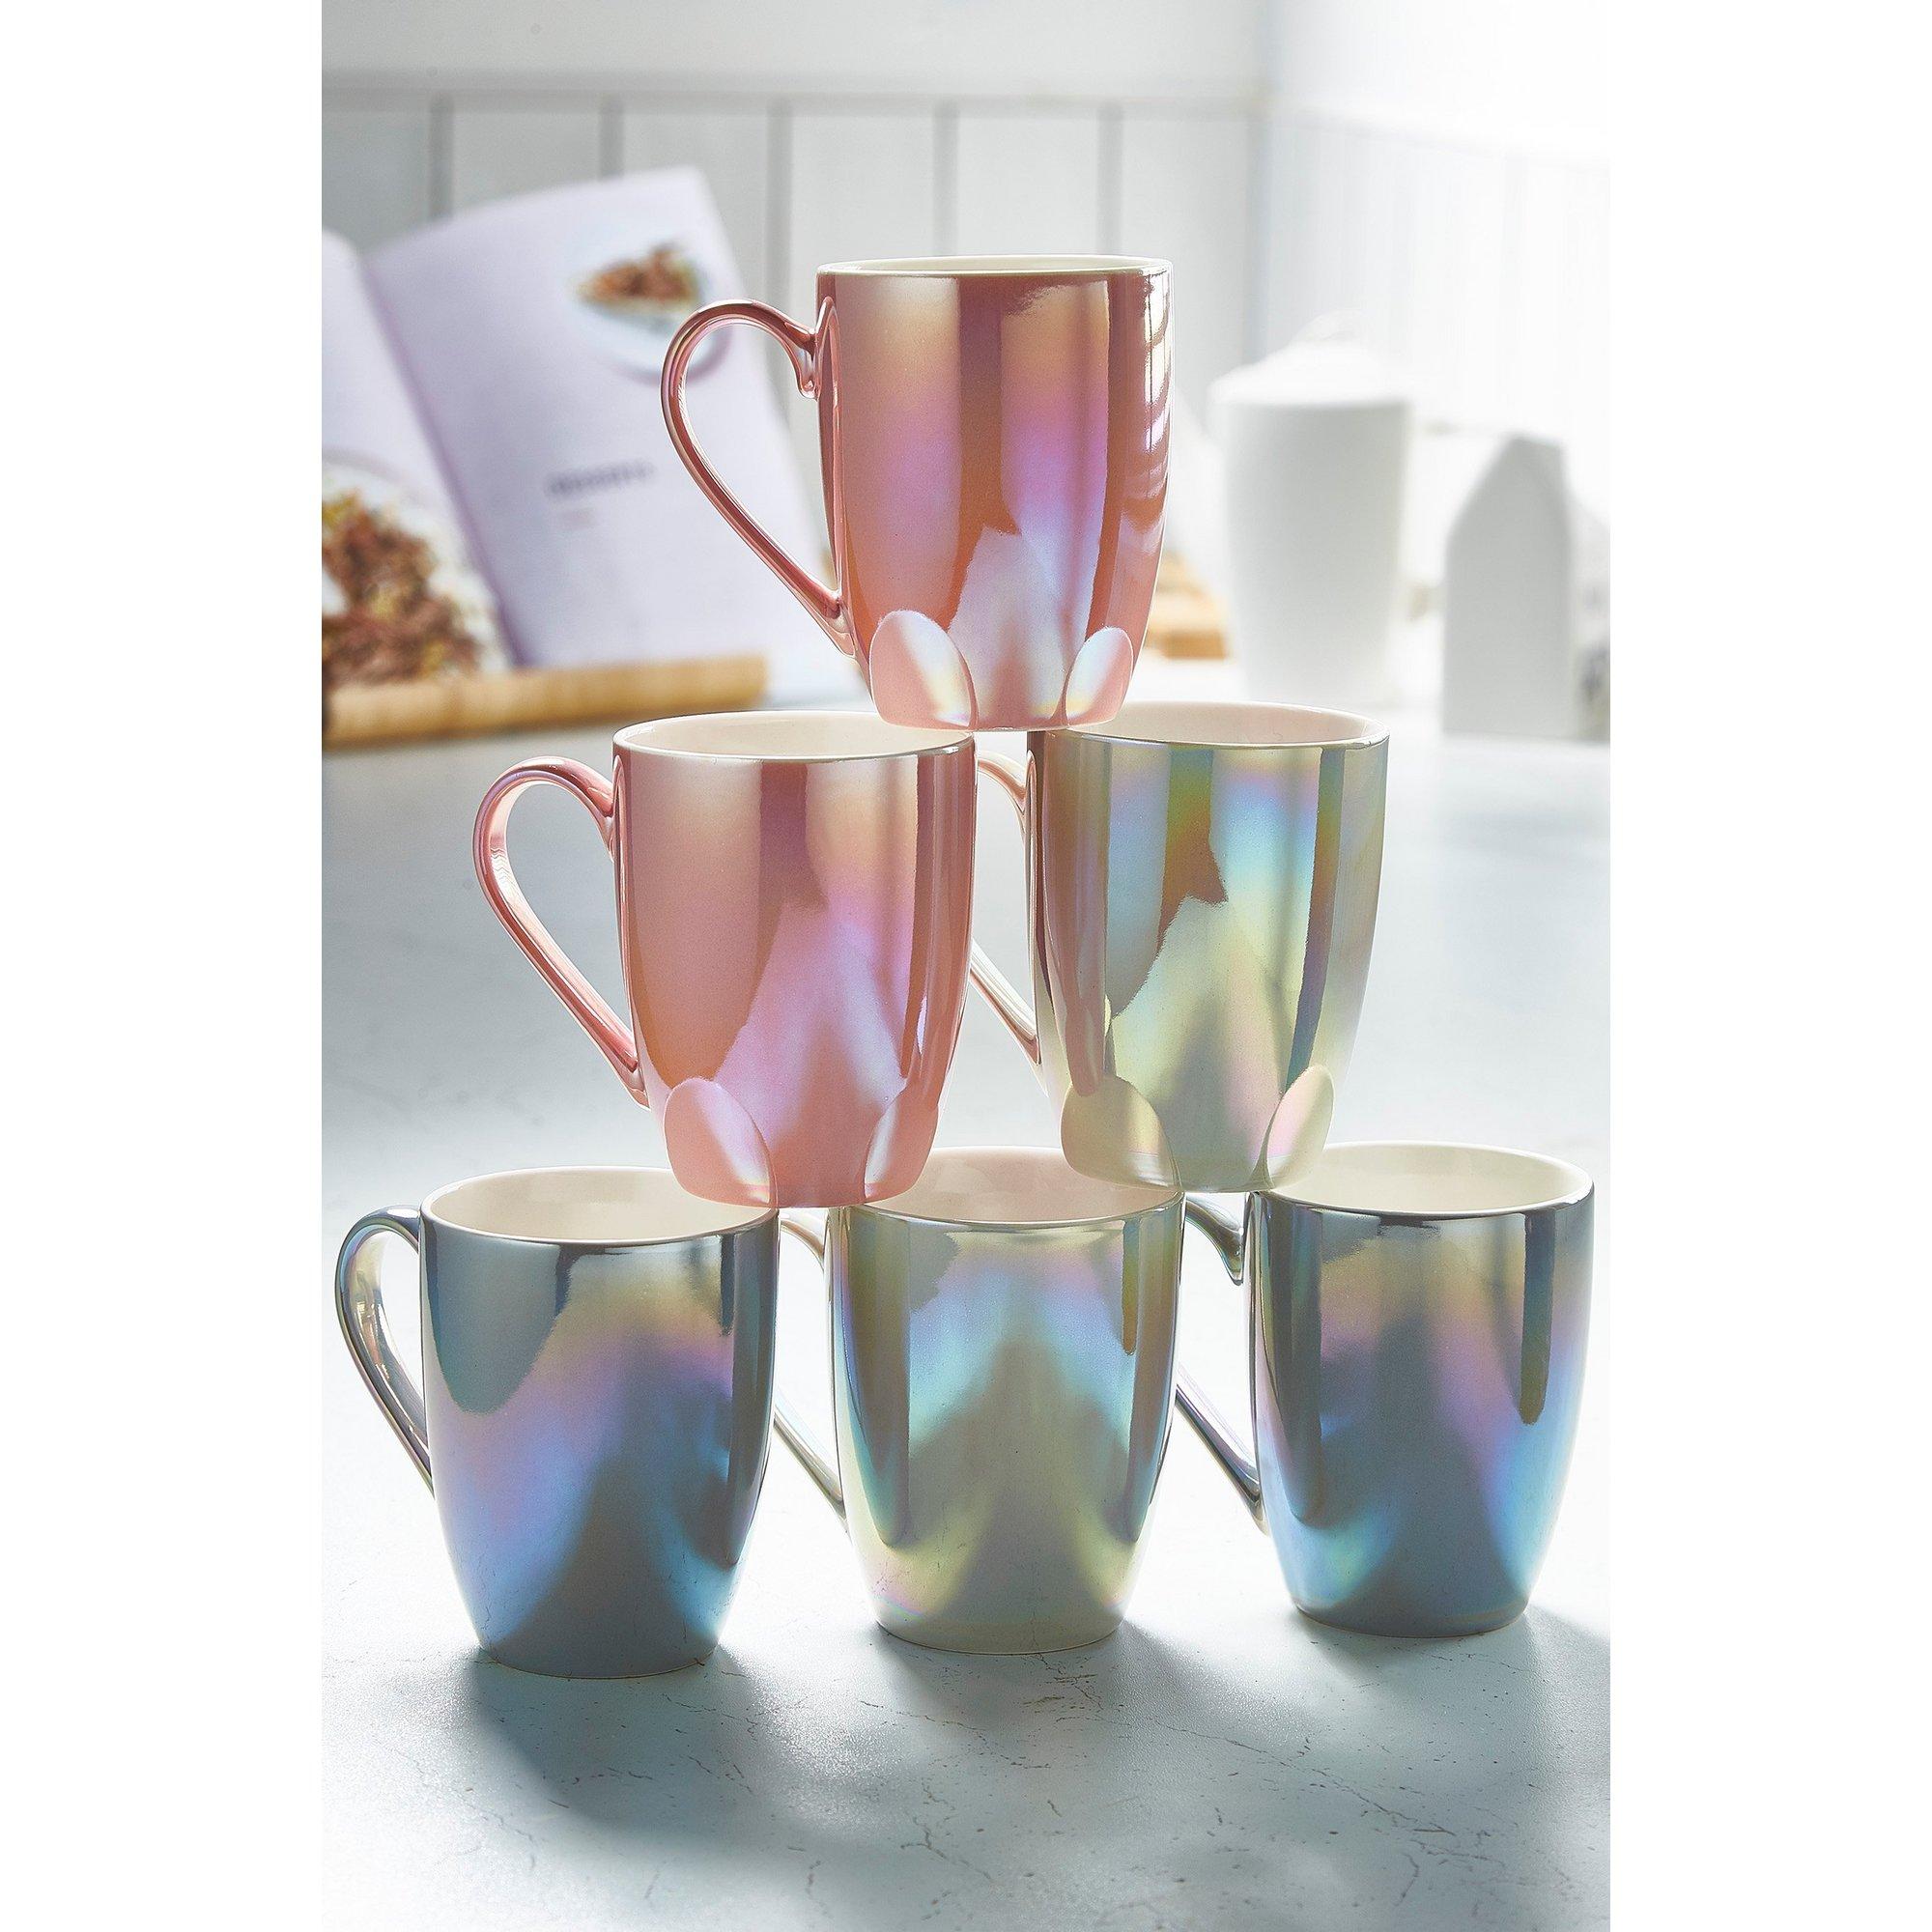 Image of 6-Piece Pearlescent Mug Set